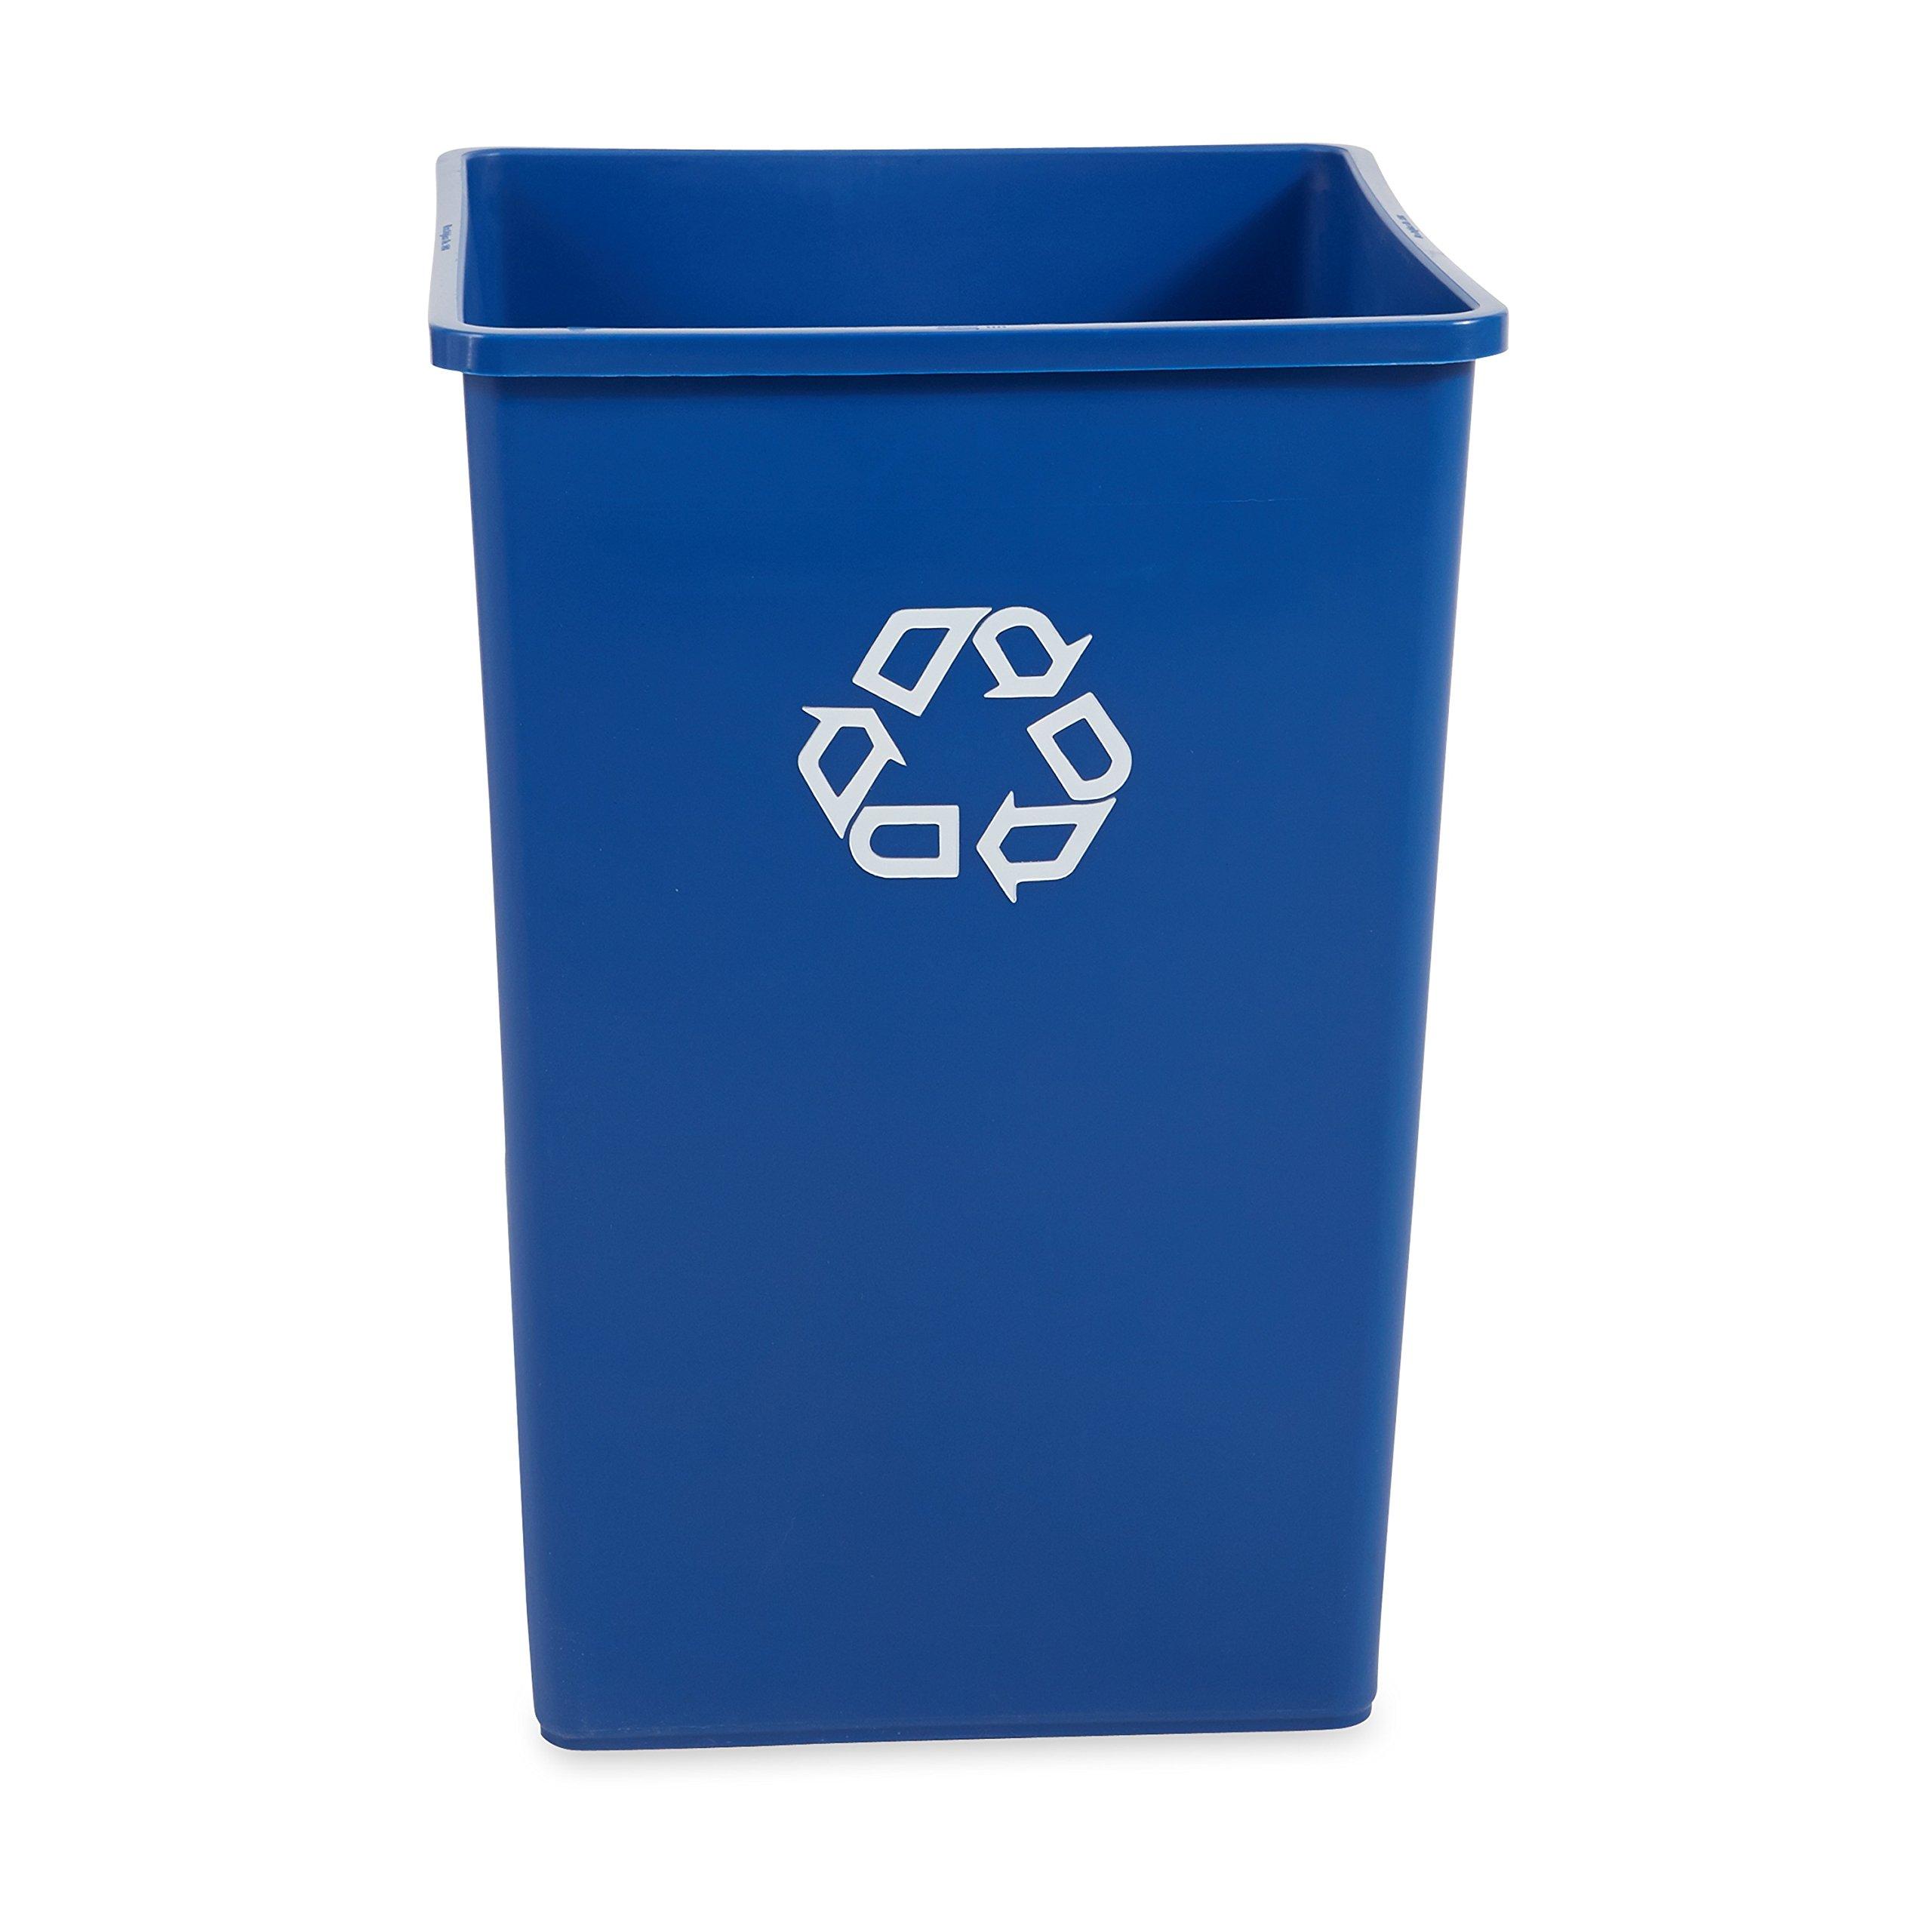 Rubbermaid Commercial Recycle Bin, 35 Gallon, Blue, FG395873BLUE) by Rubbermaid Commercial Products